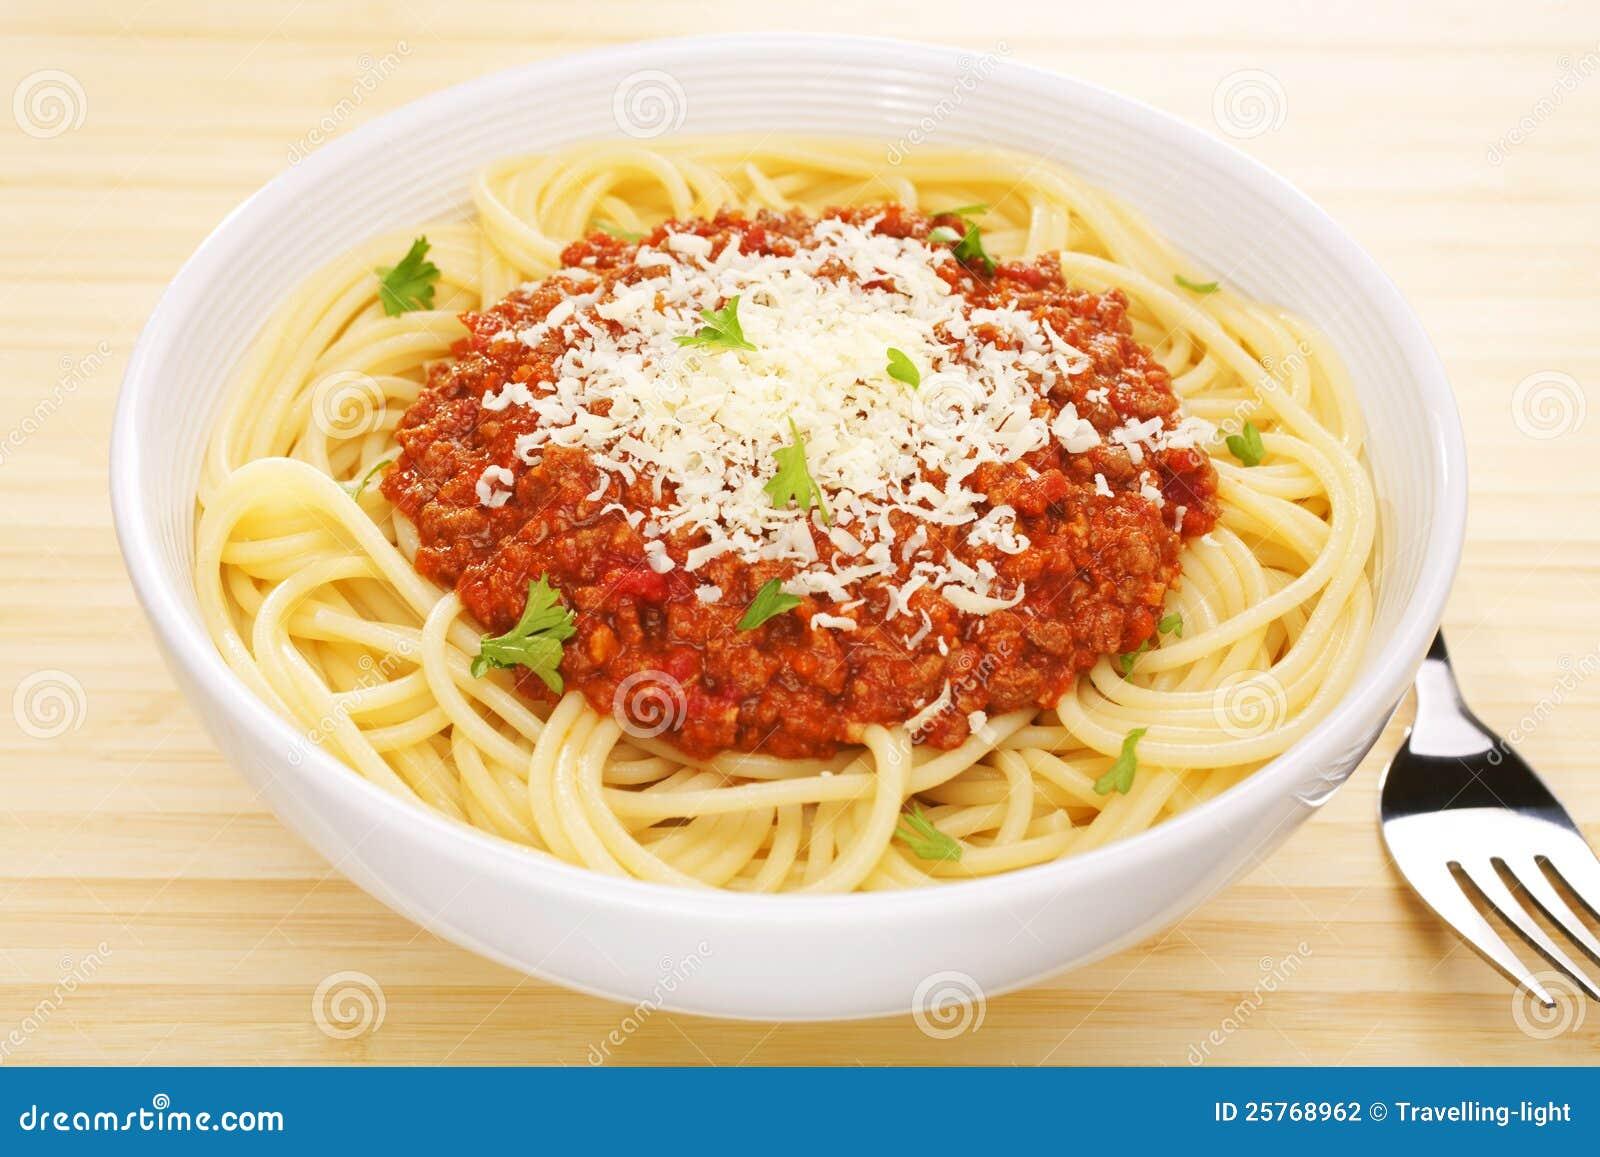 Italian food pasta spaghetti bolognese tabletop stock - Italian cuisine pasta ...